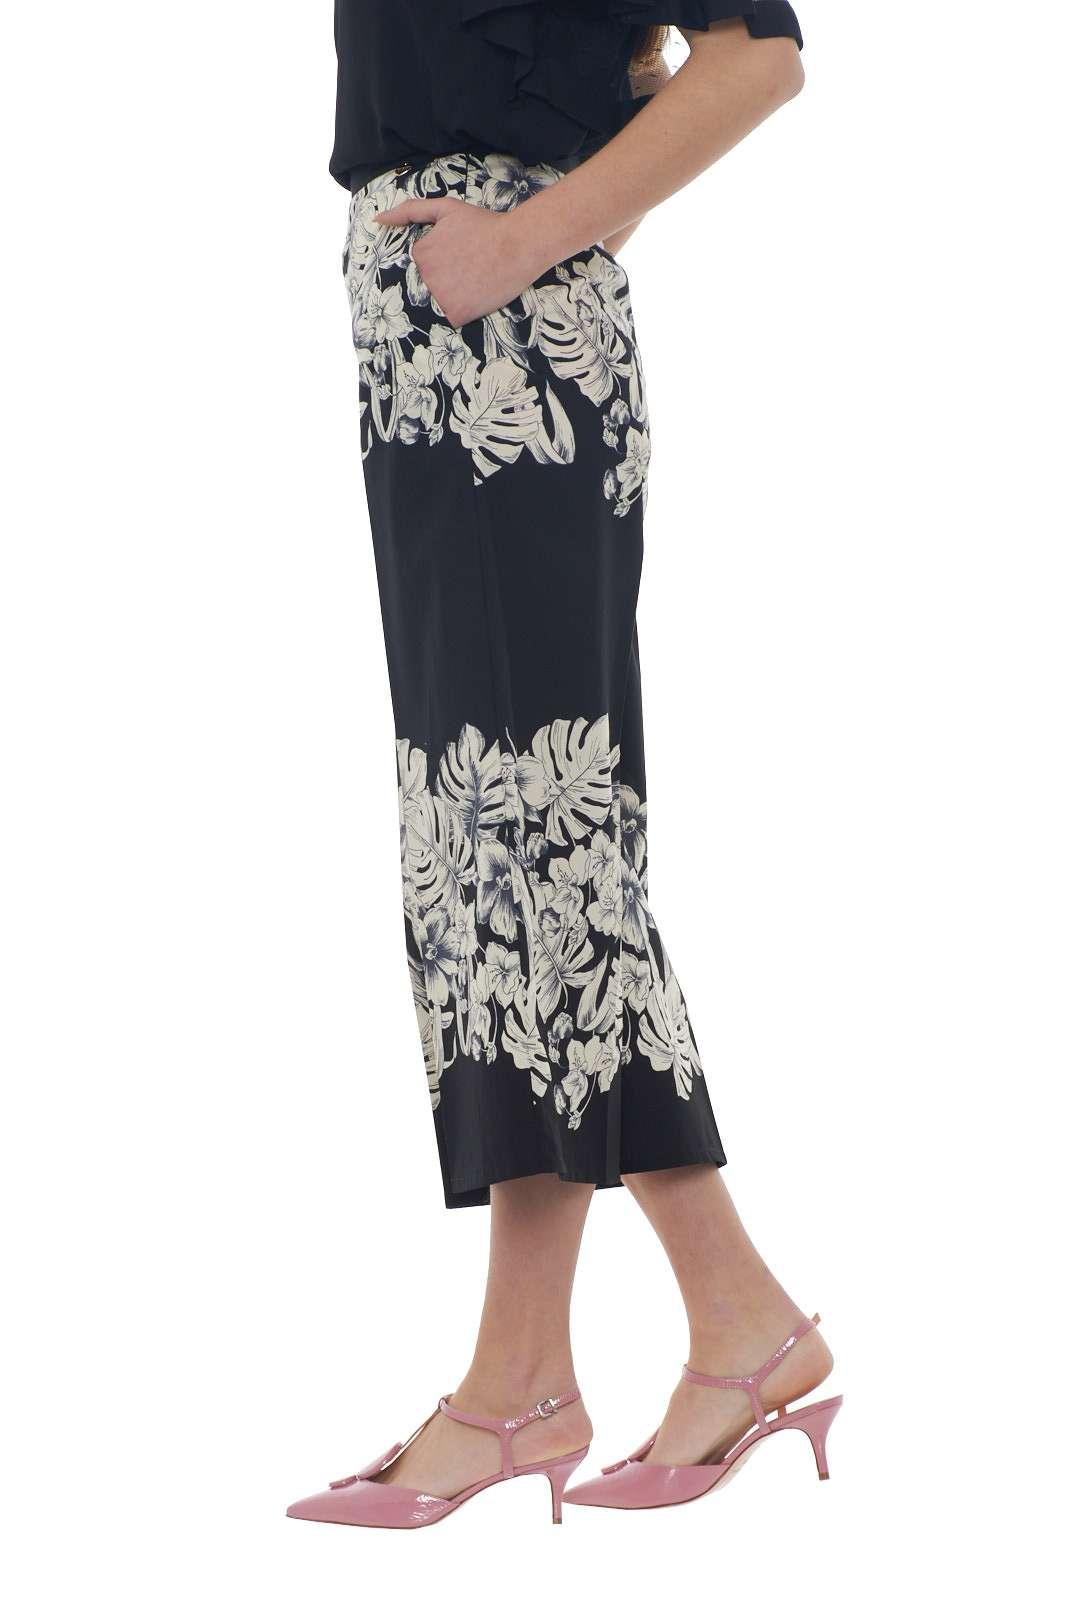 https://www.parmax.com/media/catalog/product/a/i/PE-outlet_parmax-pantaloni-donna-Twin-Set-201tt2316-B.jpg